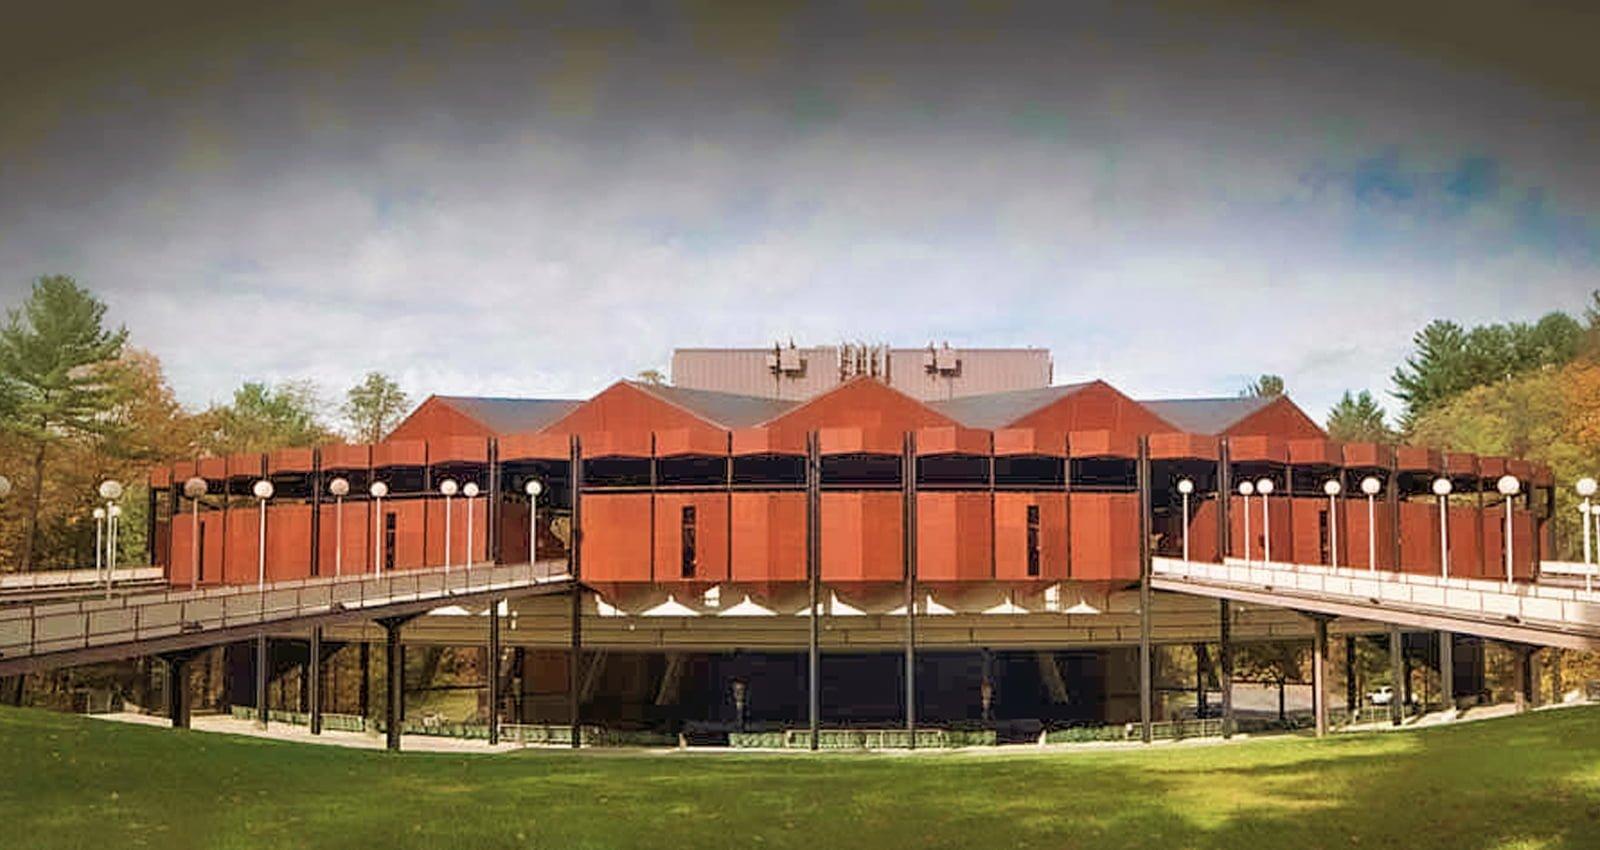 Saratoga Performing Arts Center, SPAC_Capital-Saratoga Region